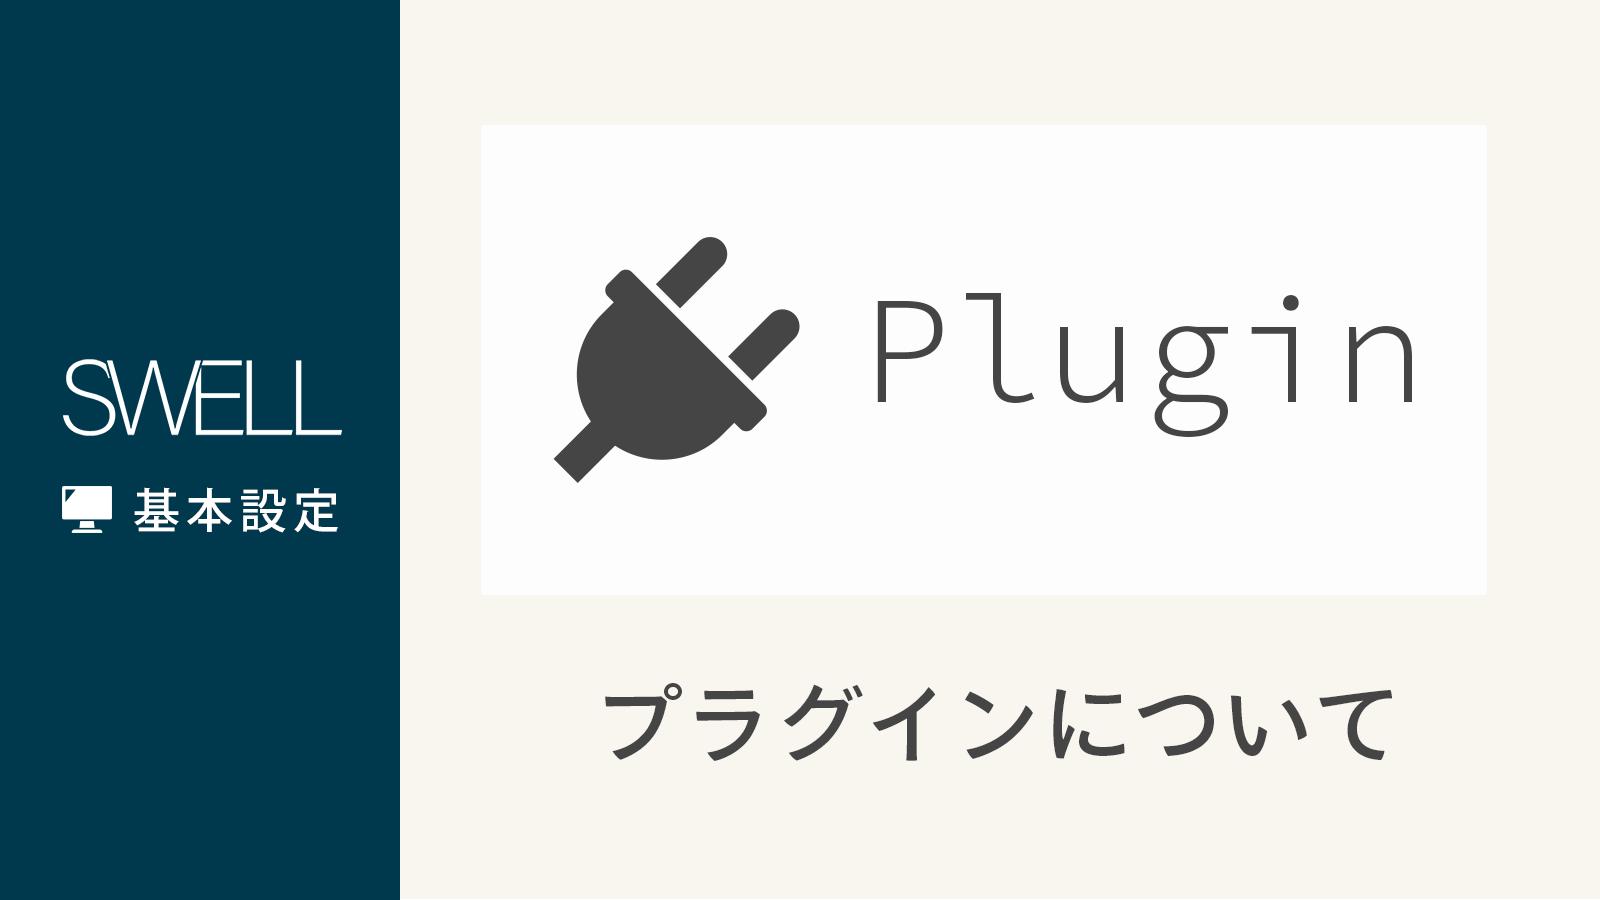 SWELLで非推奨・不必要なプラグインと、推奨プラグインについて | WordPressテーマ SWELL